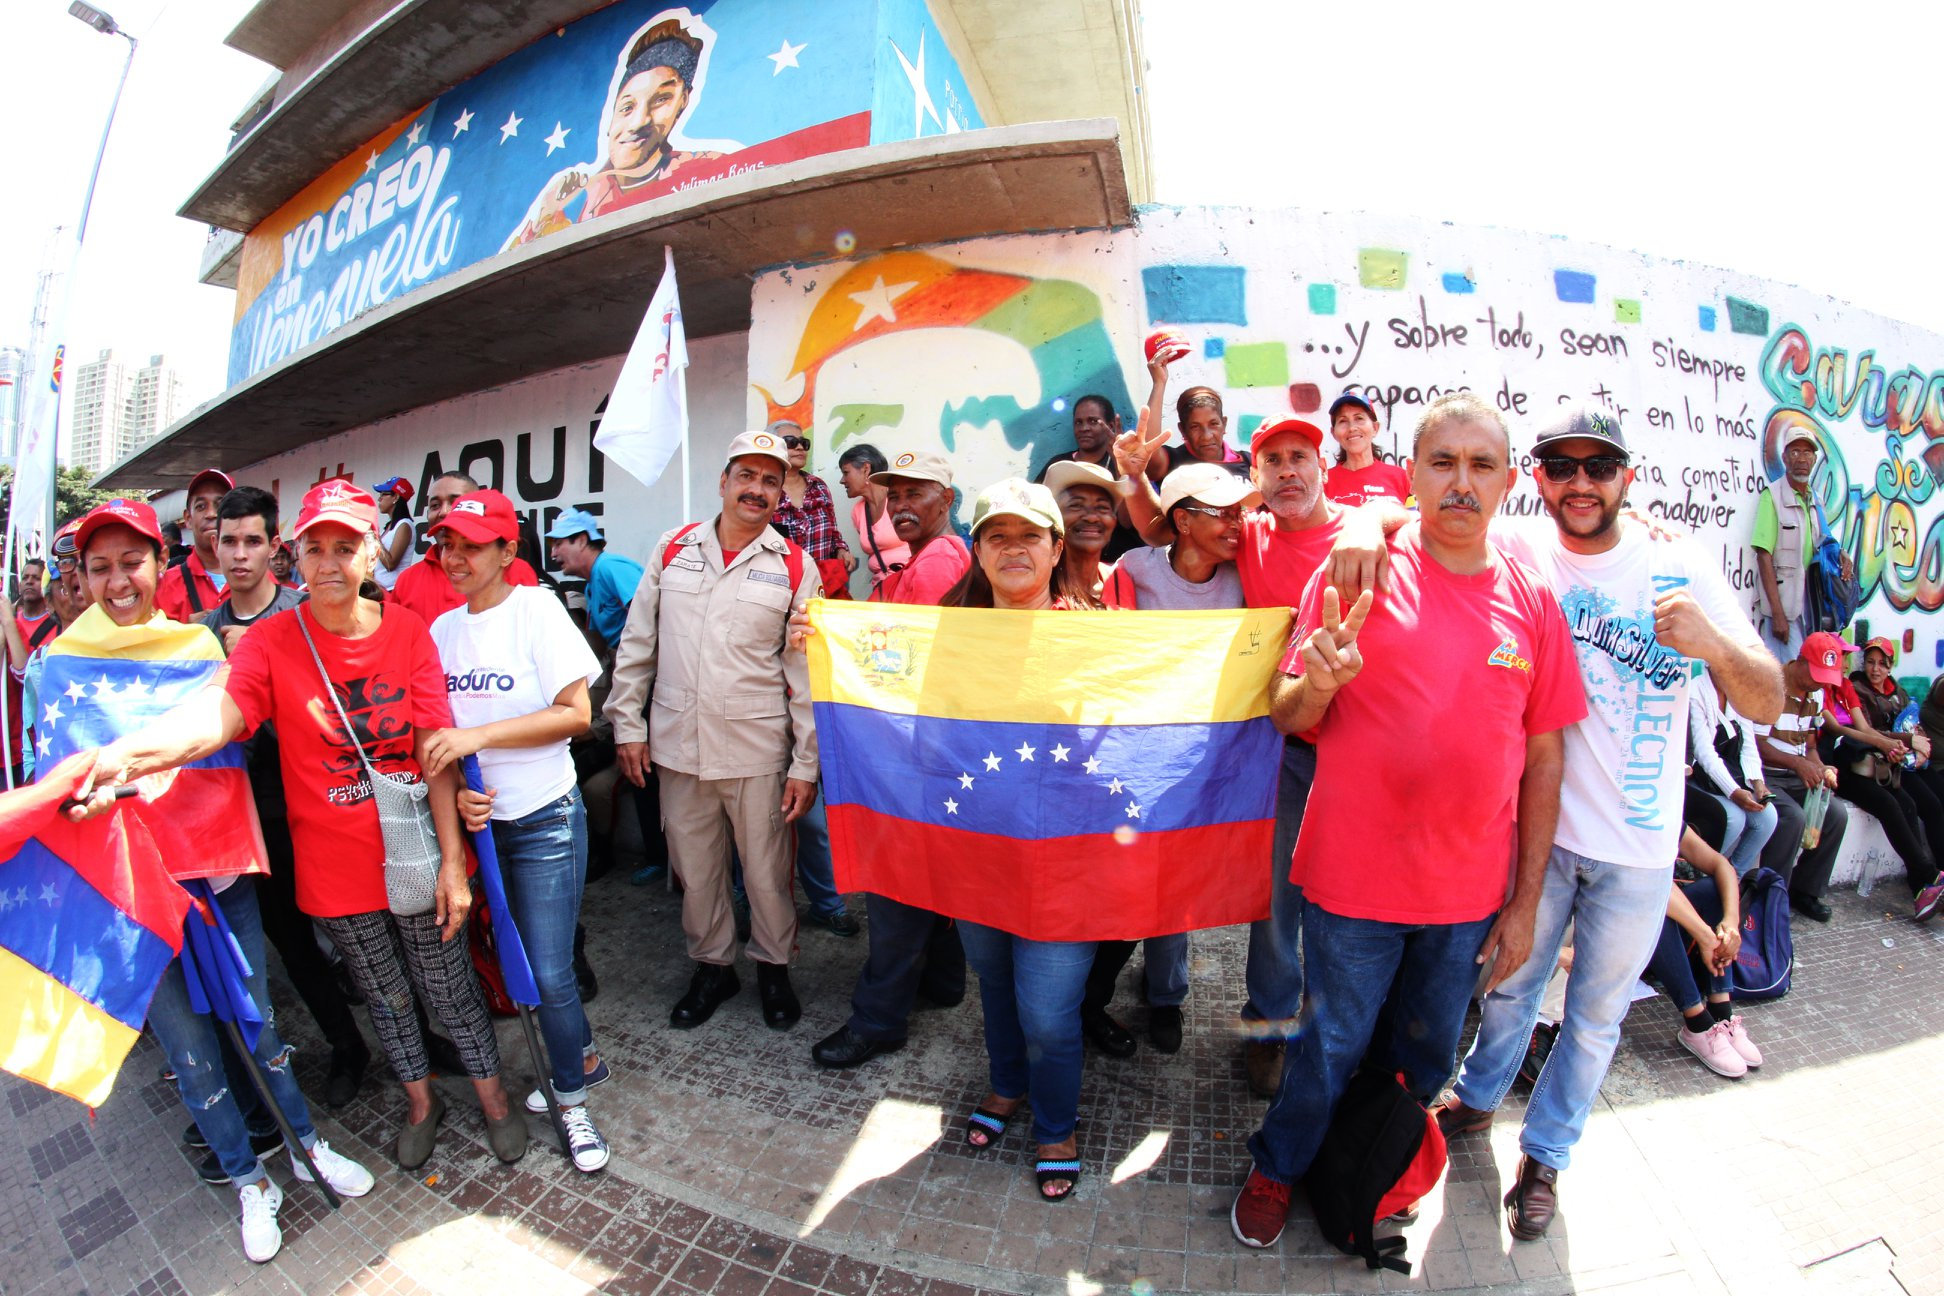 Achtergrond bij de Venezolaanse crisis